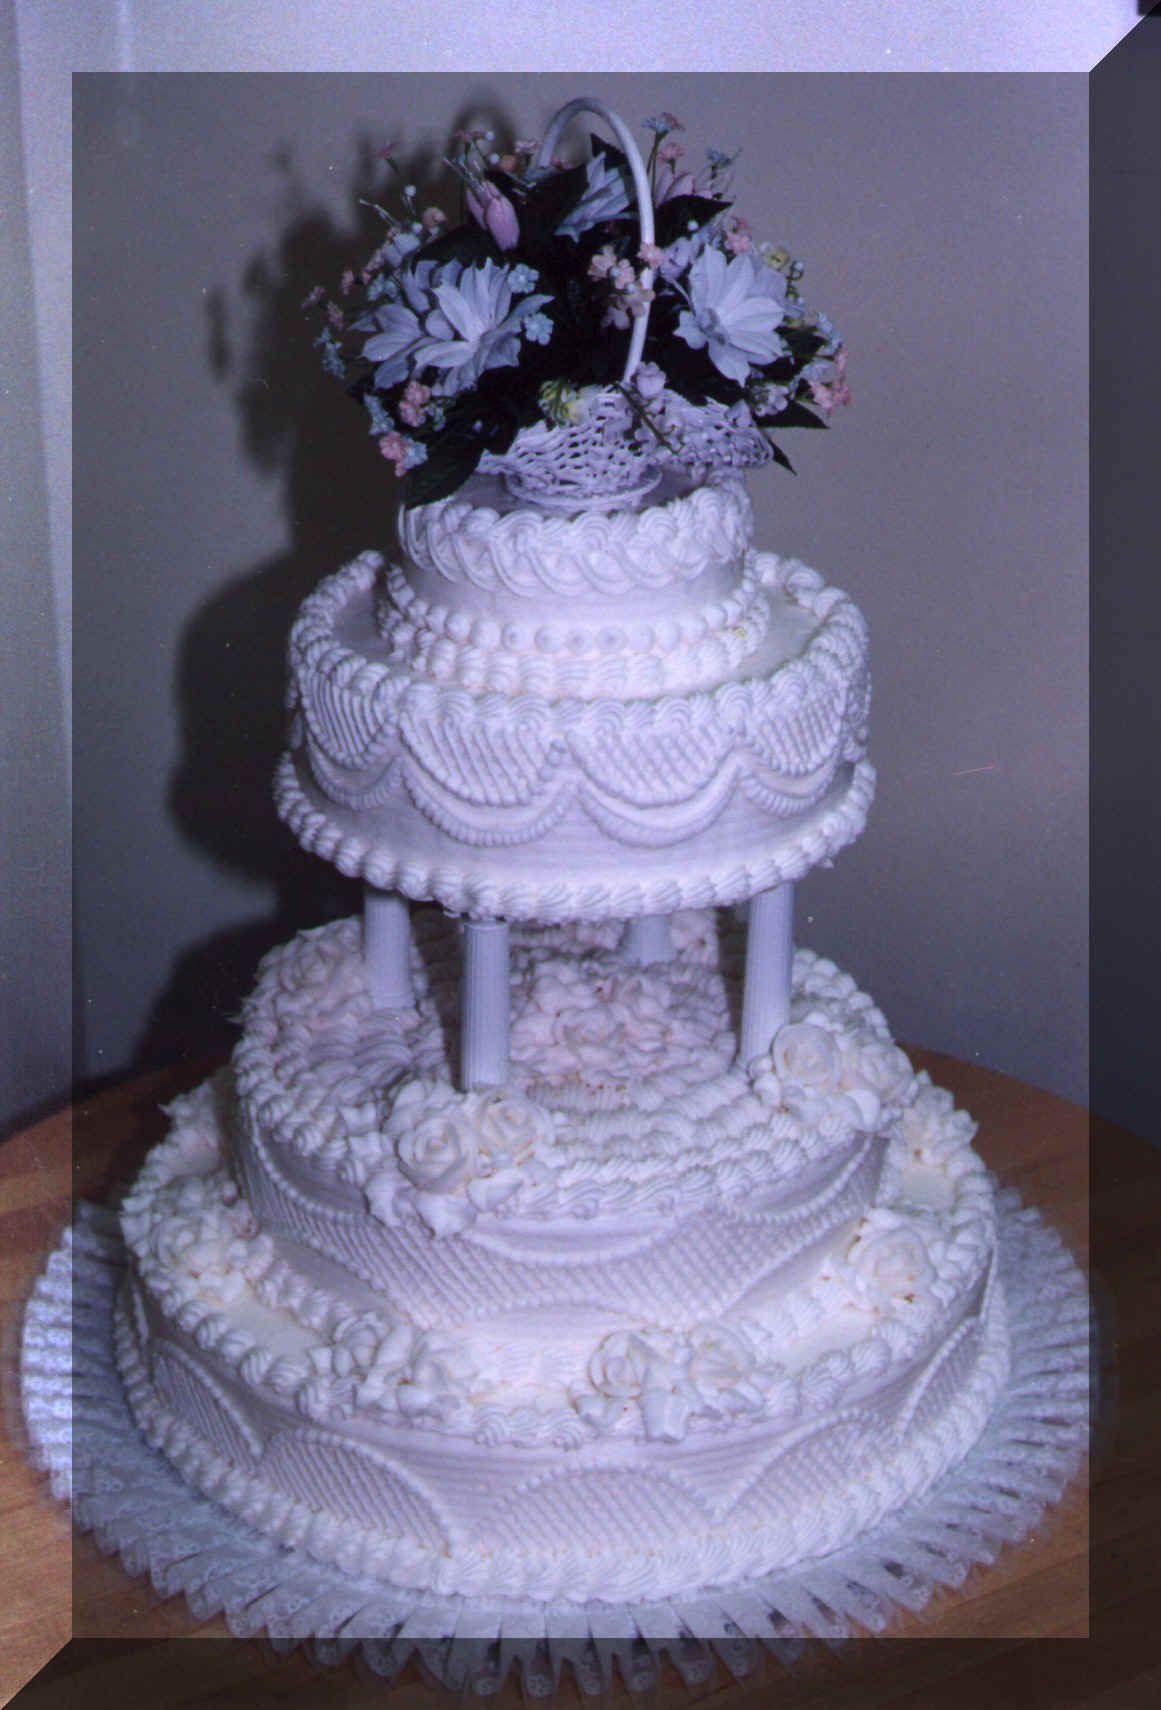 Walmart Wedding Cakes Cost  Walmart Wedding Cakes Prices